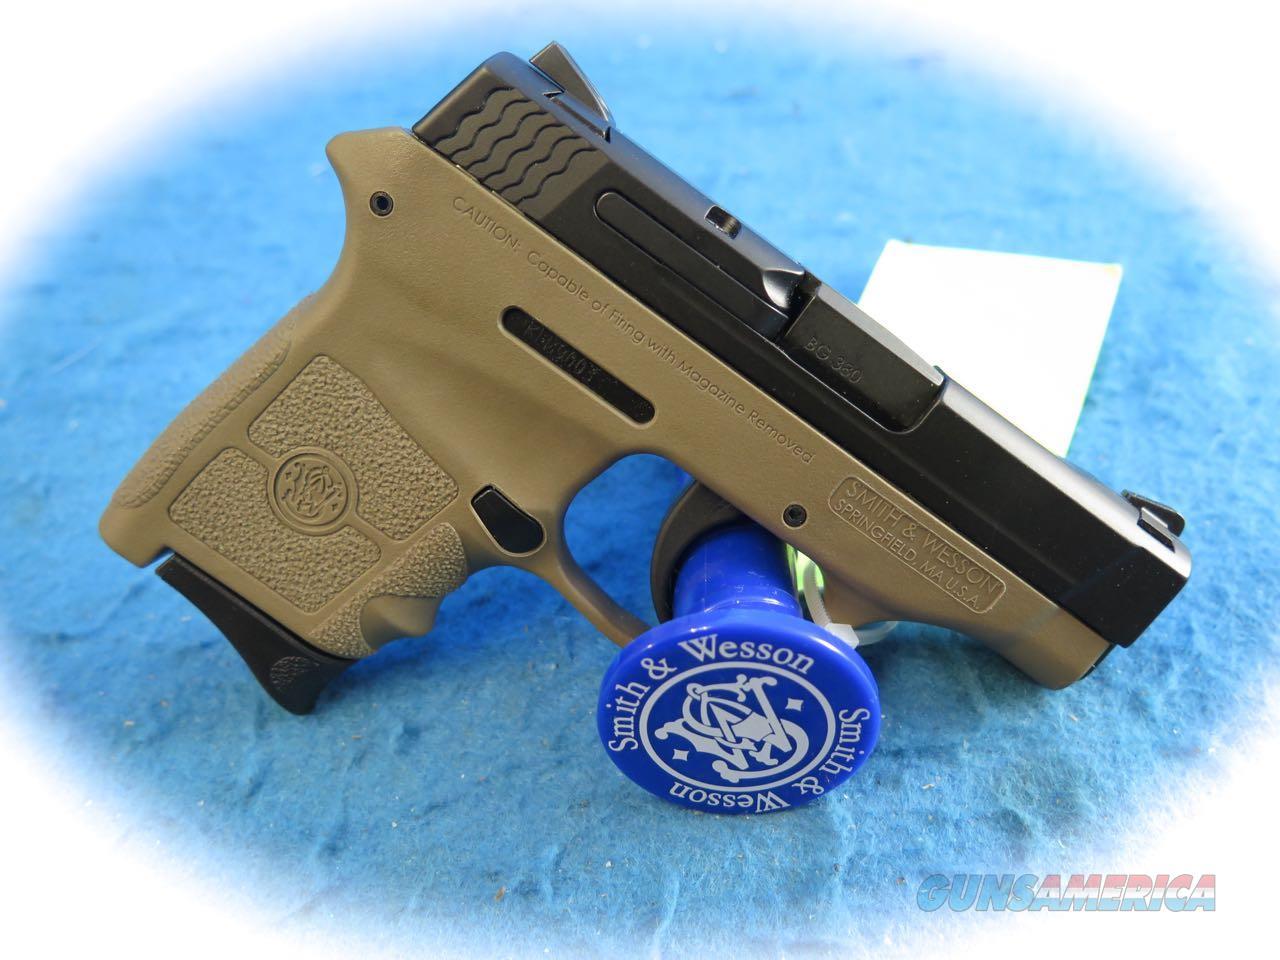 Smith & Wesson M&P Bodyguard 380 Non Laser FDE W/TS SKU 10167 **New**  Guns > Pistols > Smith & Wesson Pistols - Autos > Polymer Frame